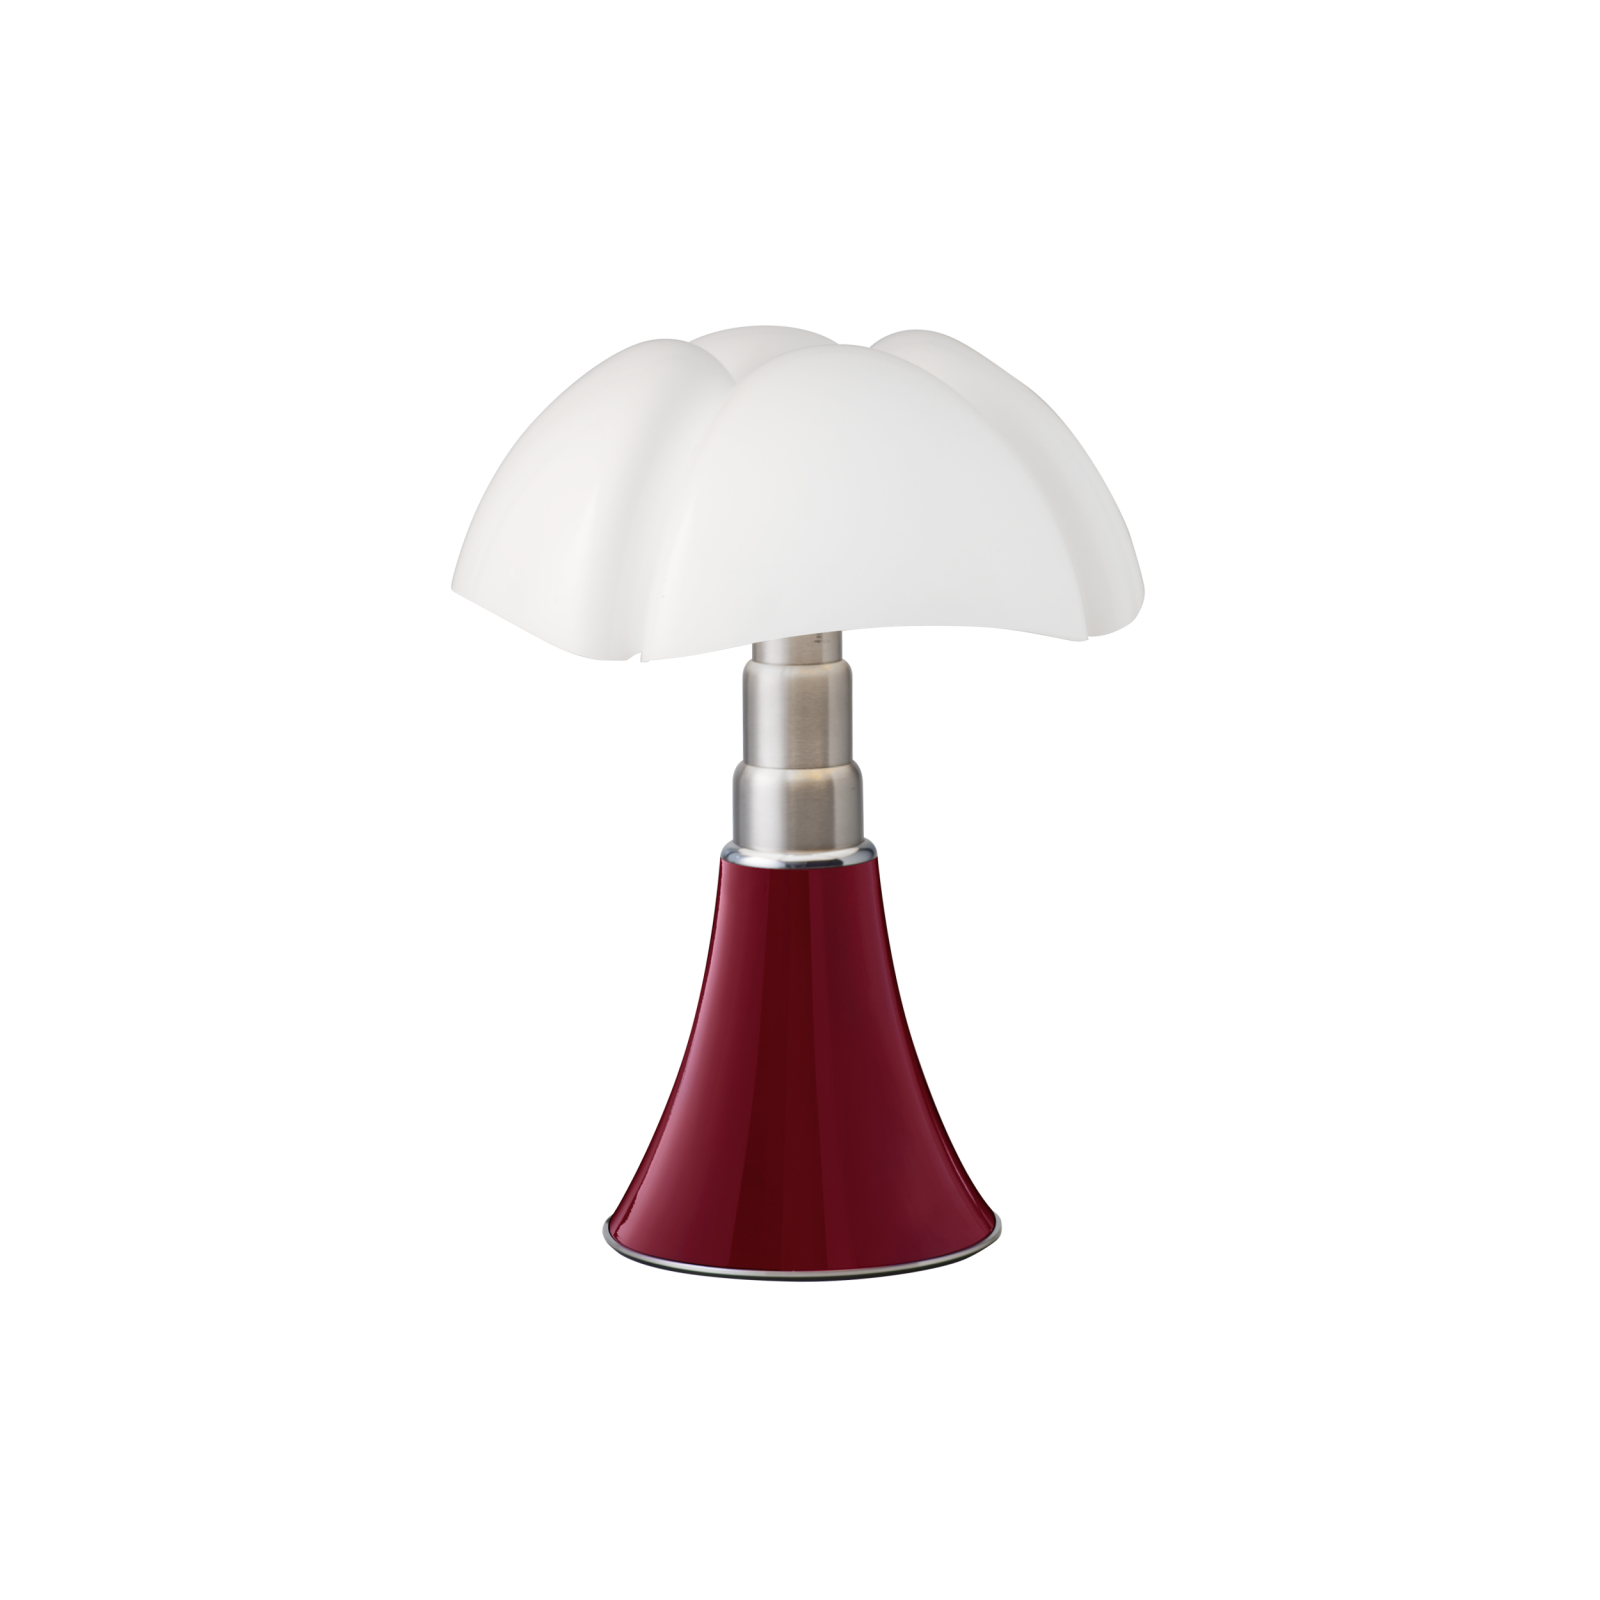 lampe poser mini pipistrello de martinelli luce rouge. Black Bedroom Furniture Sets. Home Design Ideas